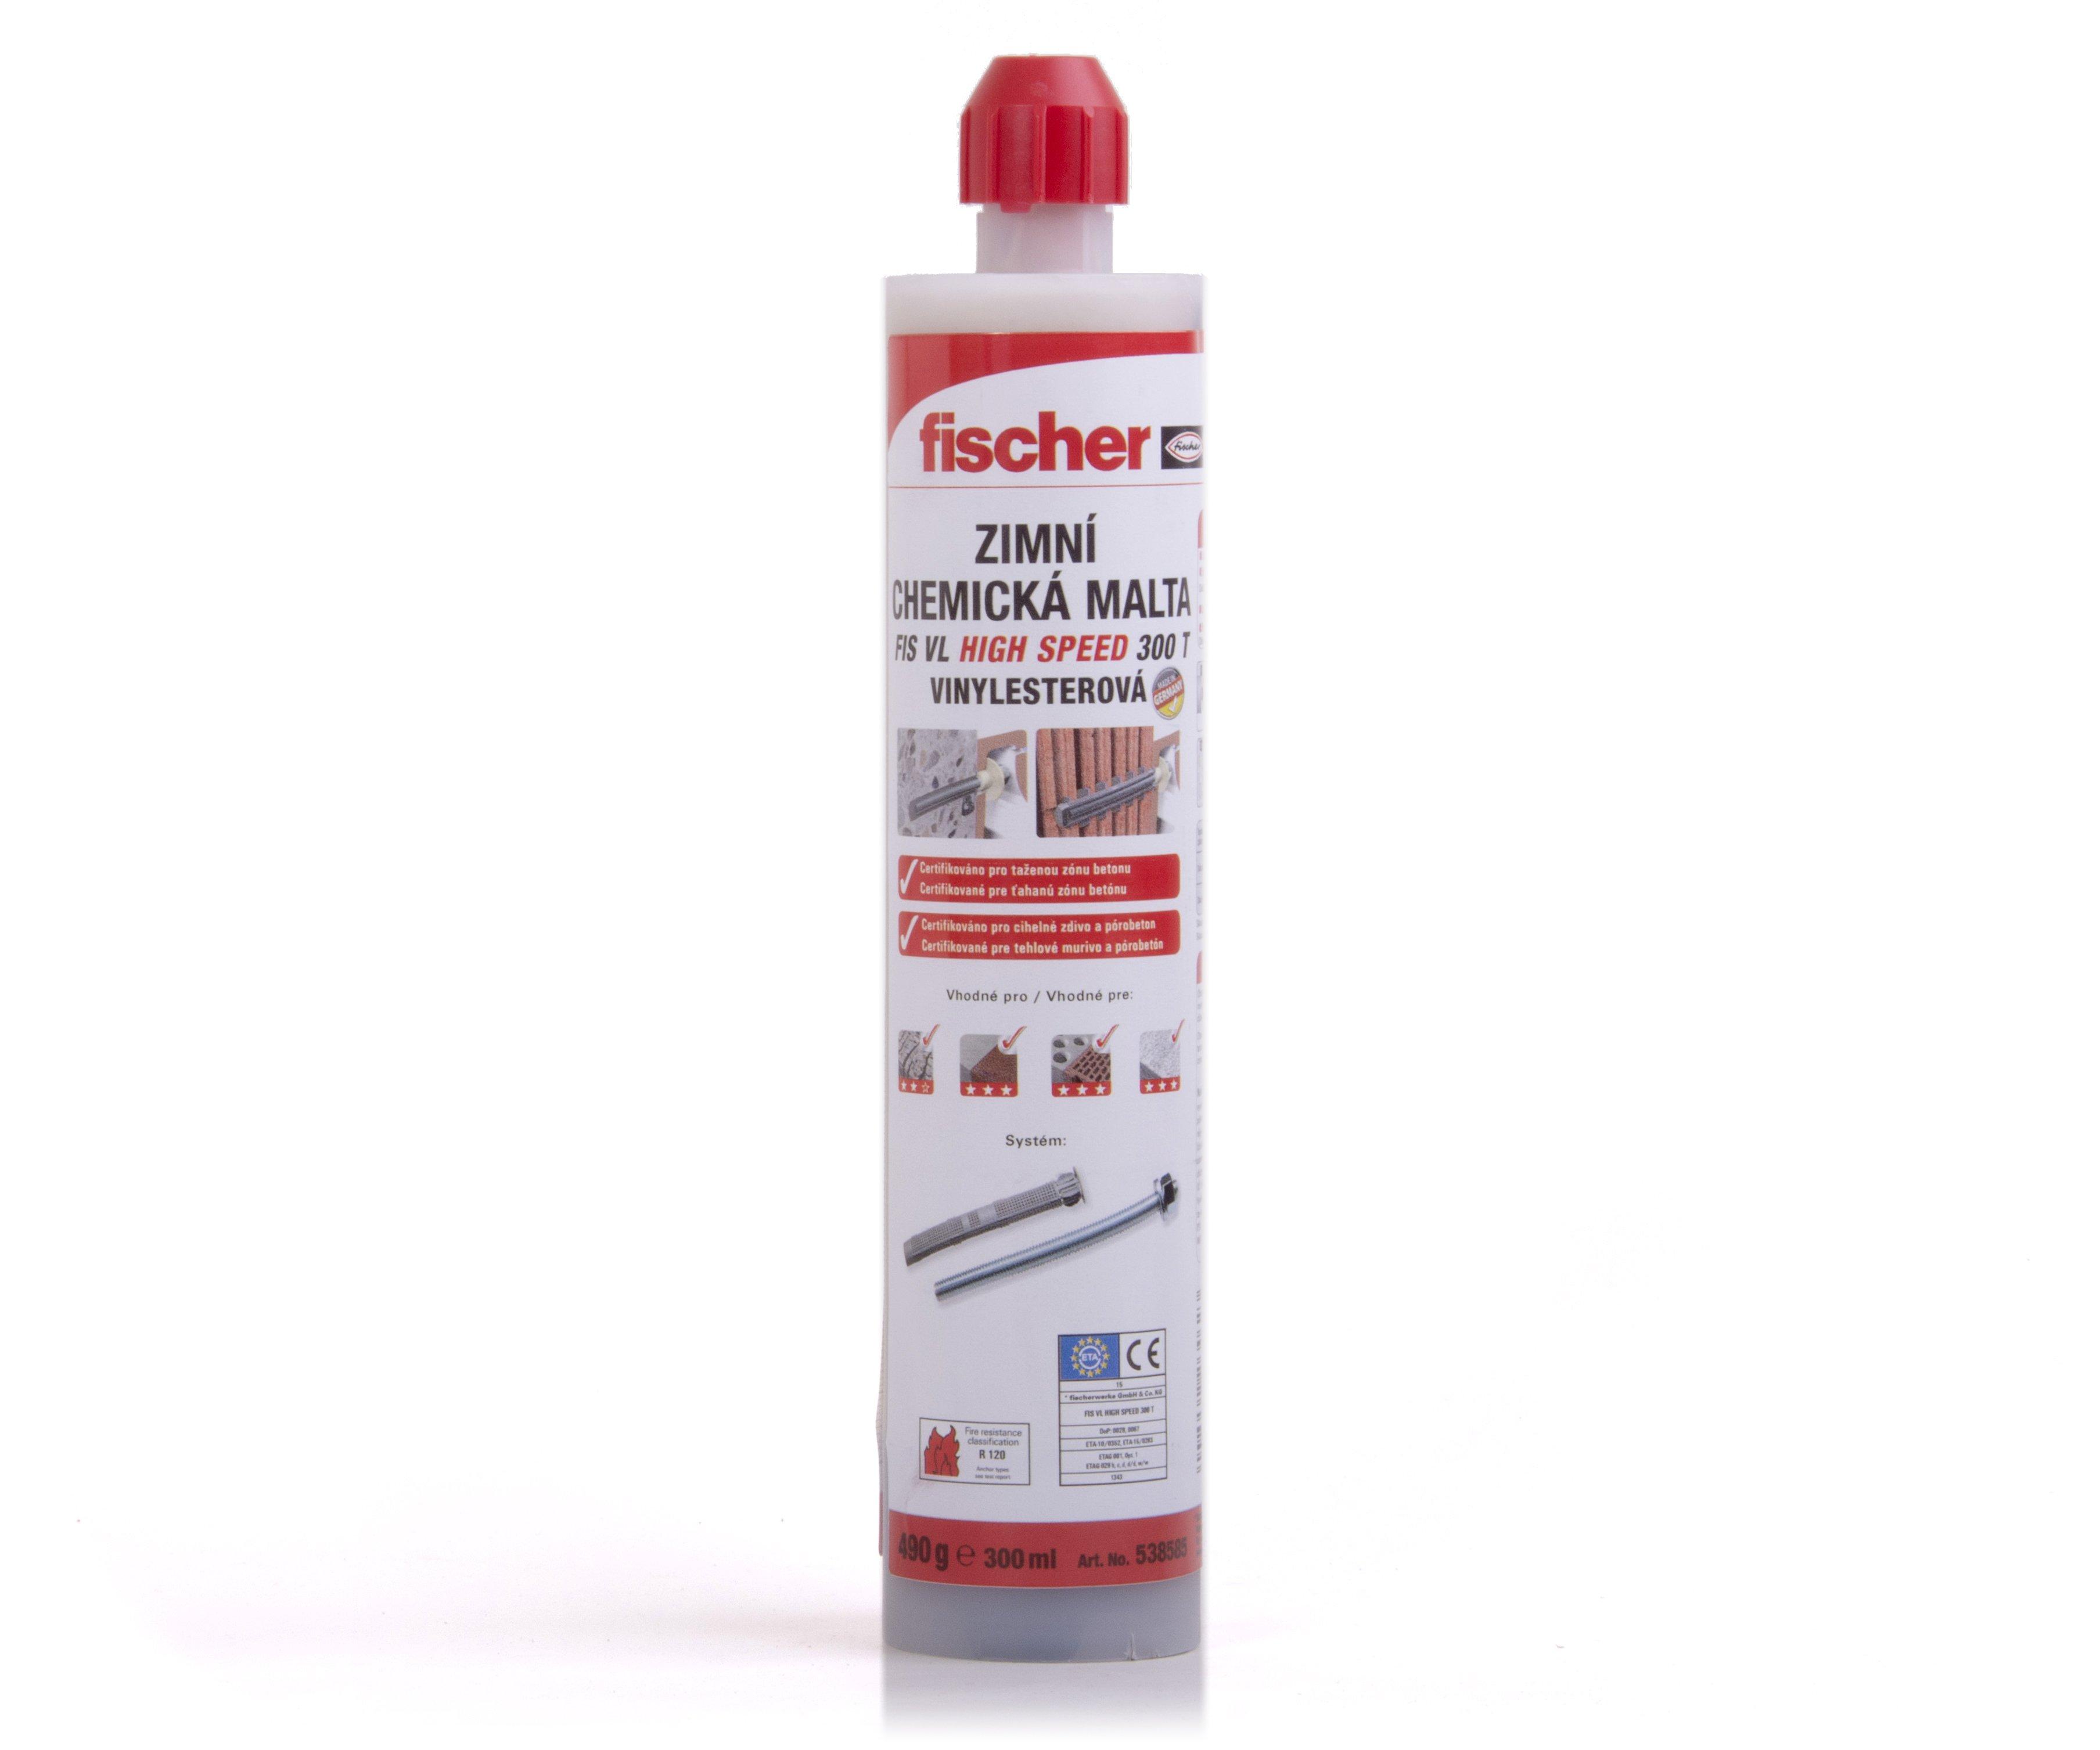 Chemická malta zimní FIS VL 300 T HIGH SPEED Fischer